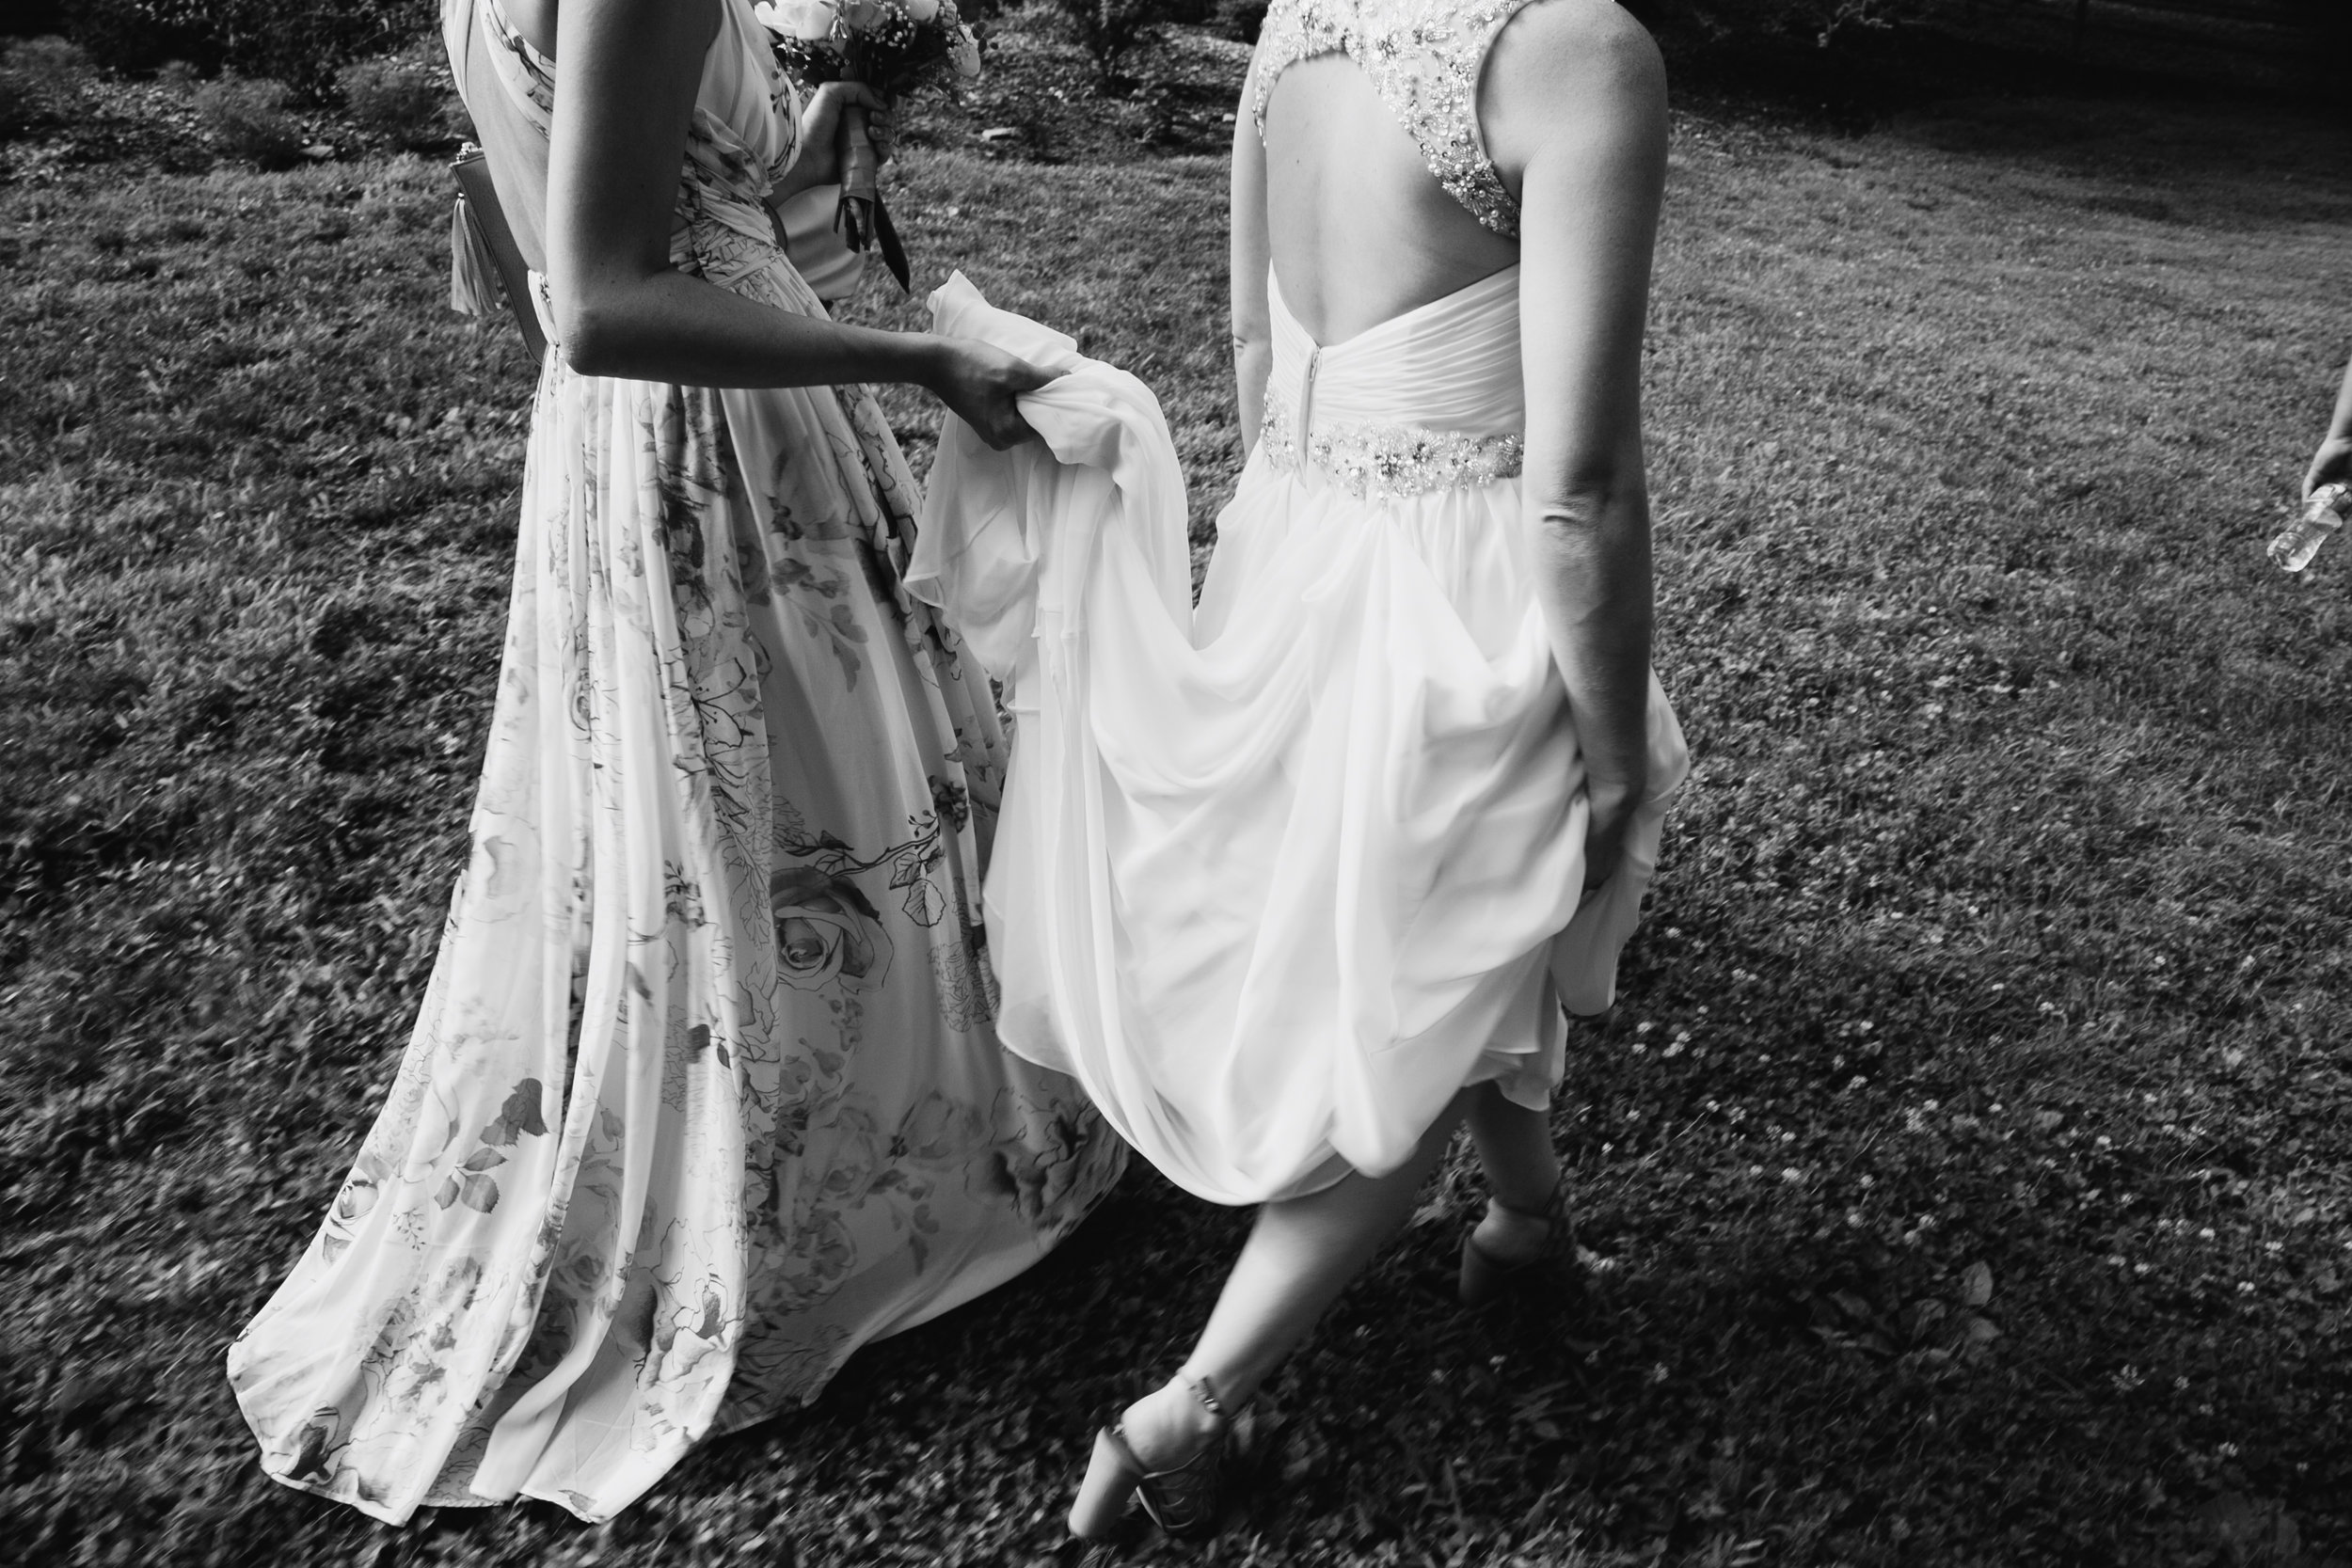 TYLER ARBORETUM WEDDING PHOTOGRAPHY LOVESTRUCK PICTURES-021.jpg